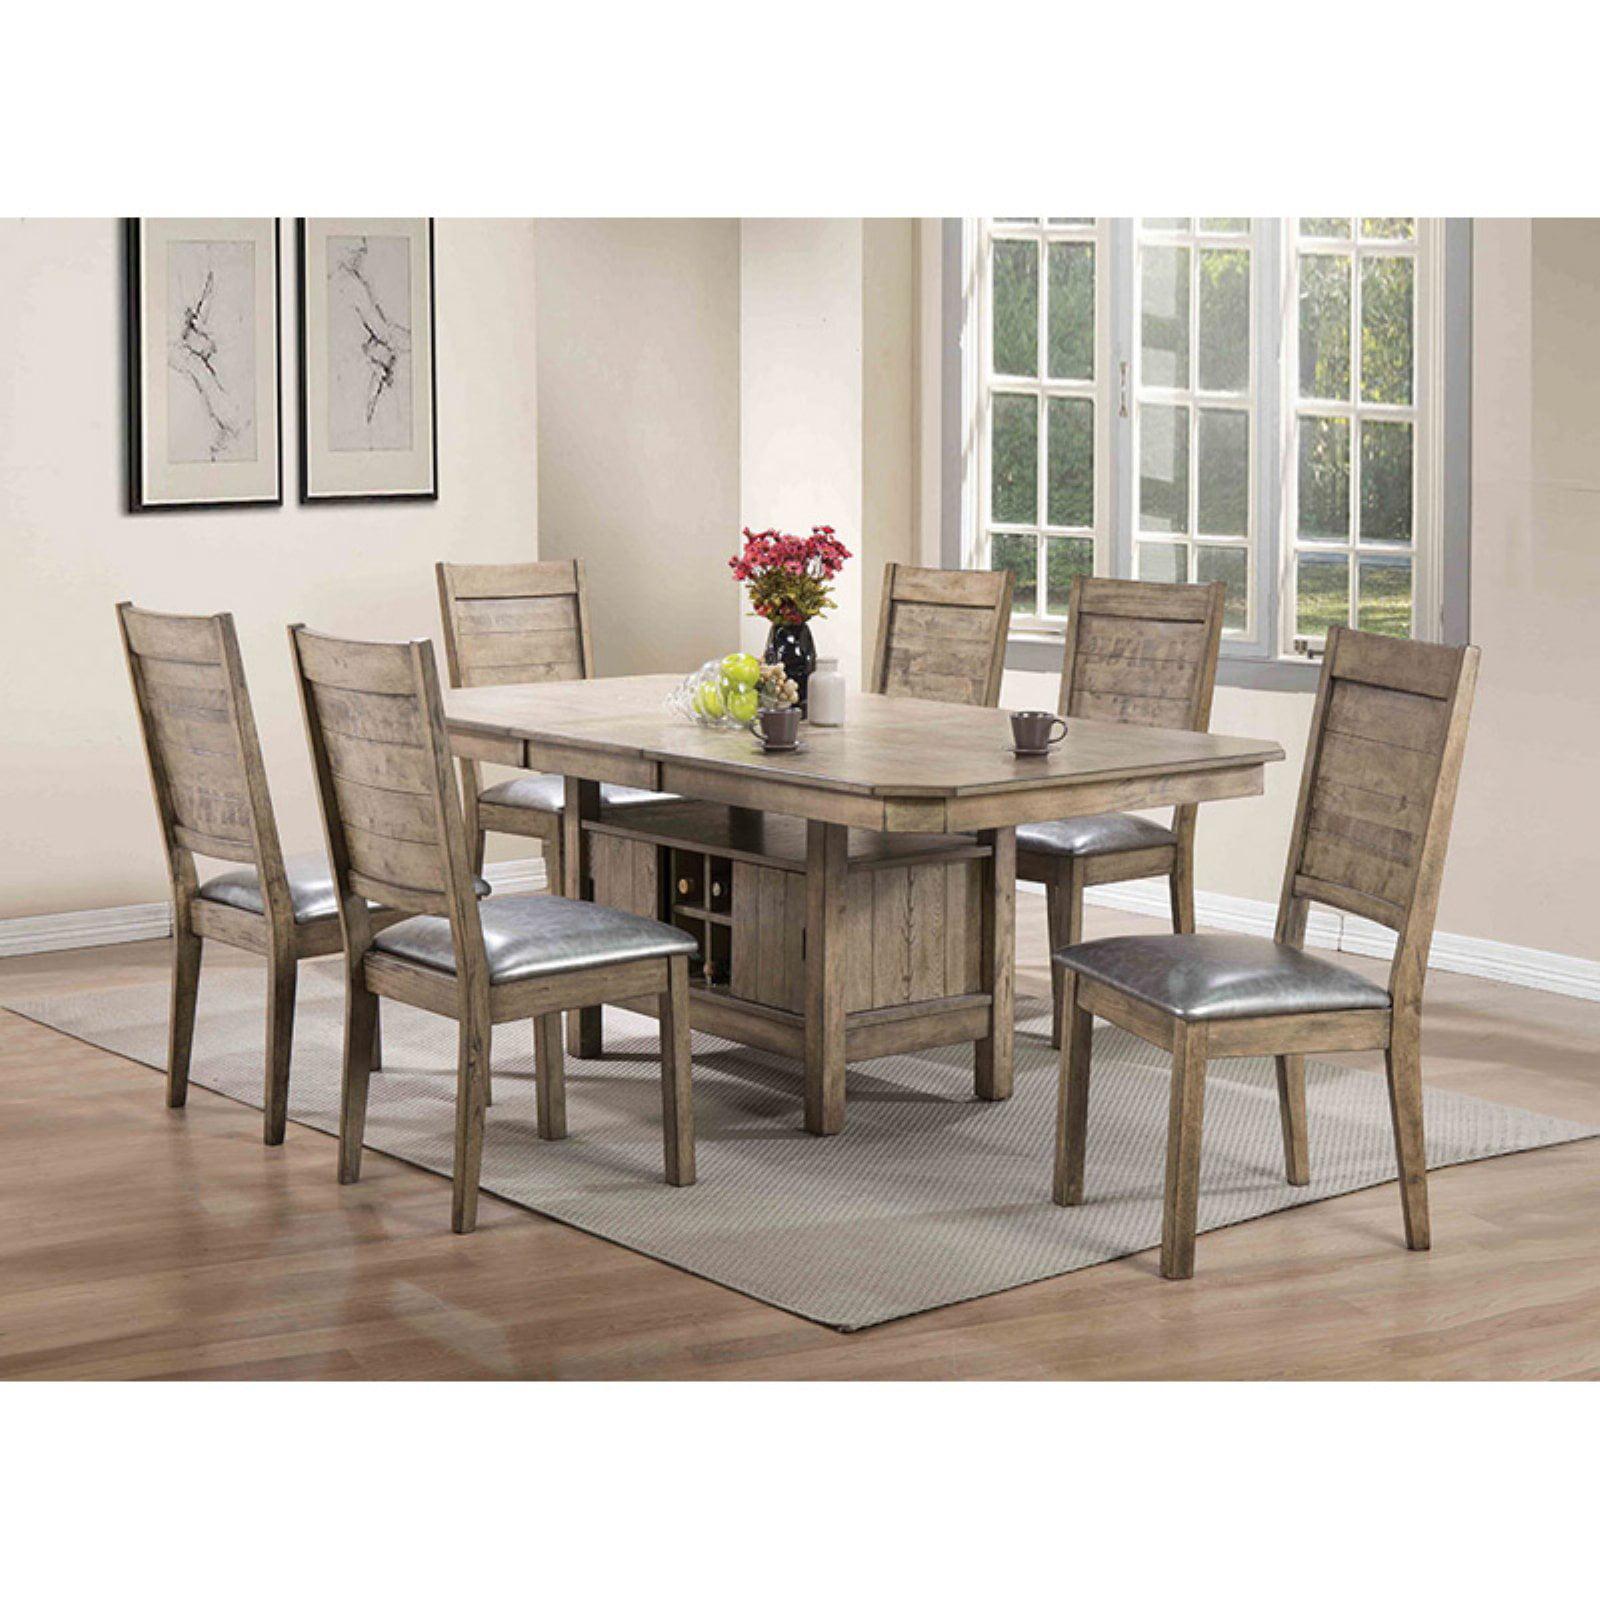 ACME Ramona Dining Table, Rustic Oak by Acme Furniture